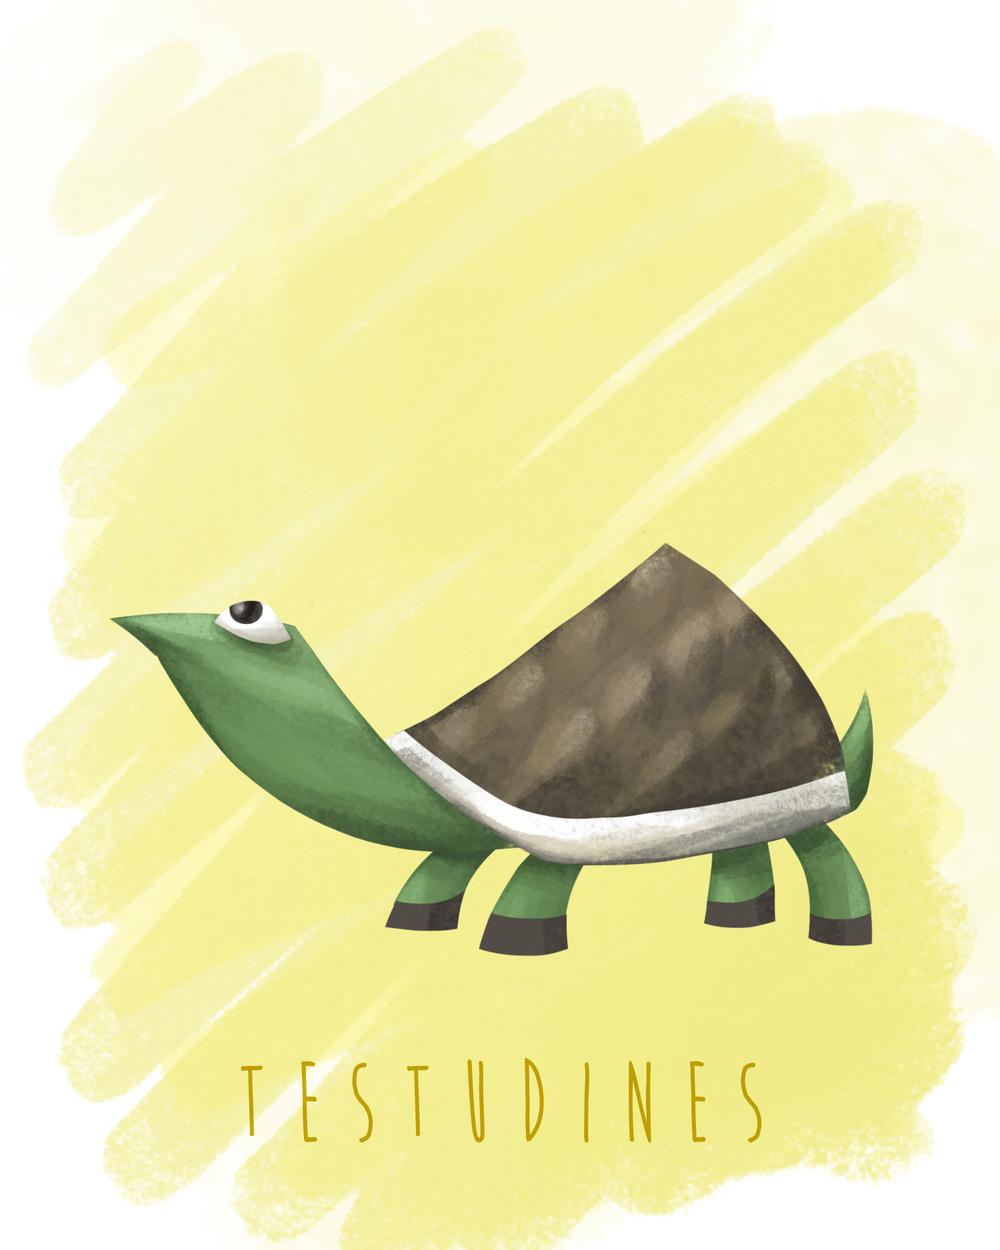 Families_Testudines_yellow.jpg